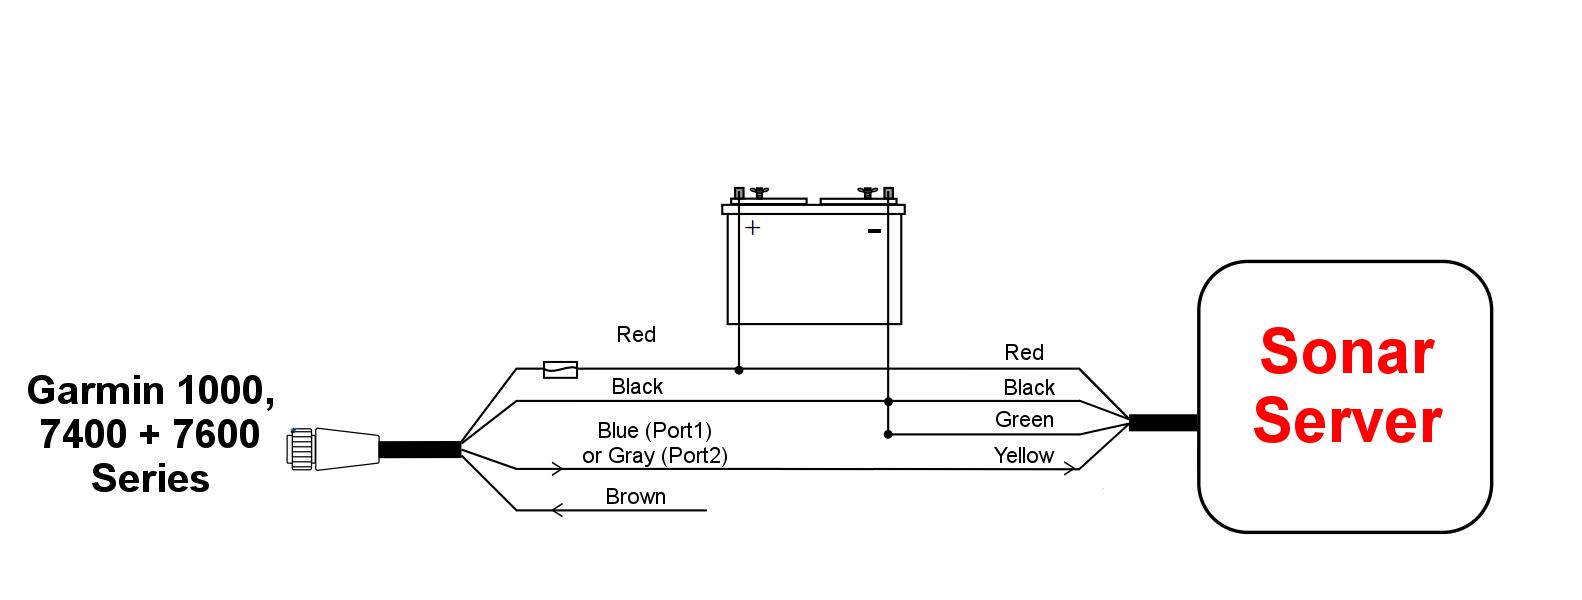 Nmea 0183 Wiring Garmin Solutions 2010c Diagram The Interfacing To Multi Function Displays Sonar Server American